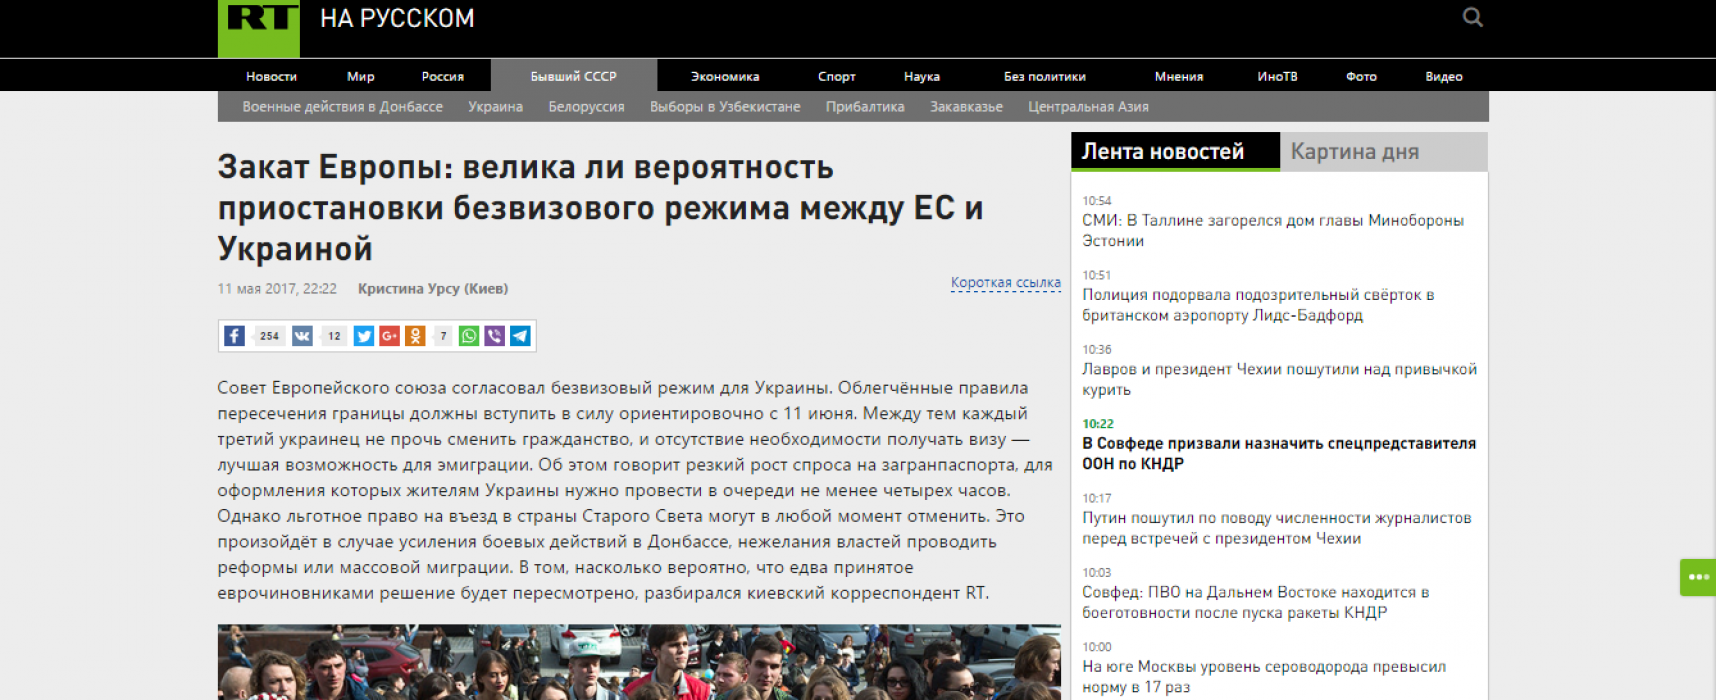 Fake: EU Can End Visa Free Travel for Ukrainians because of Donbas War